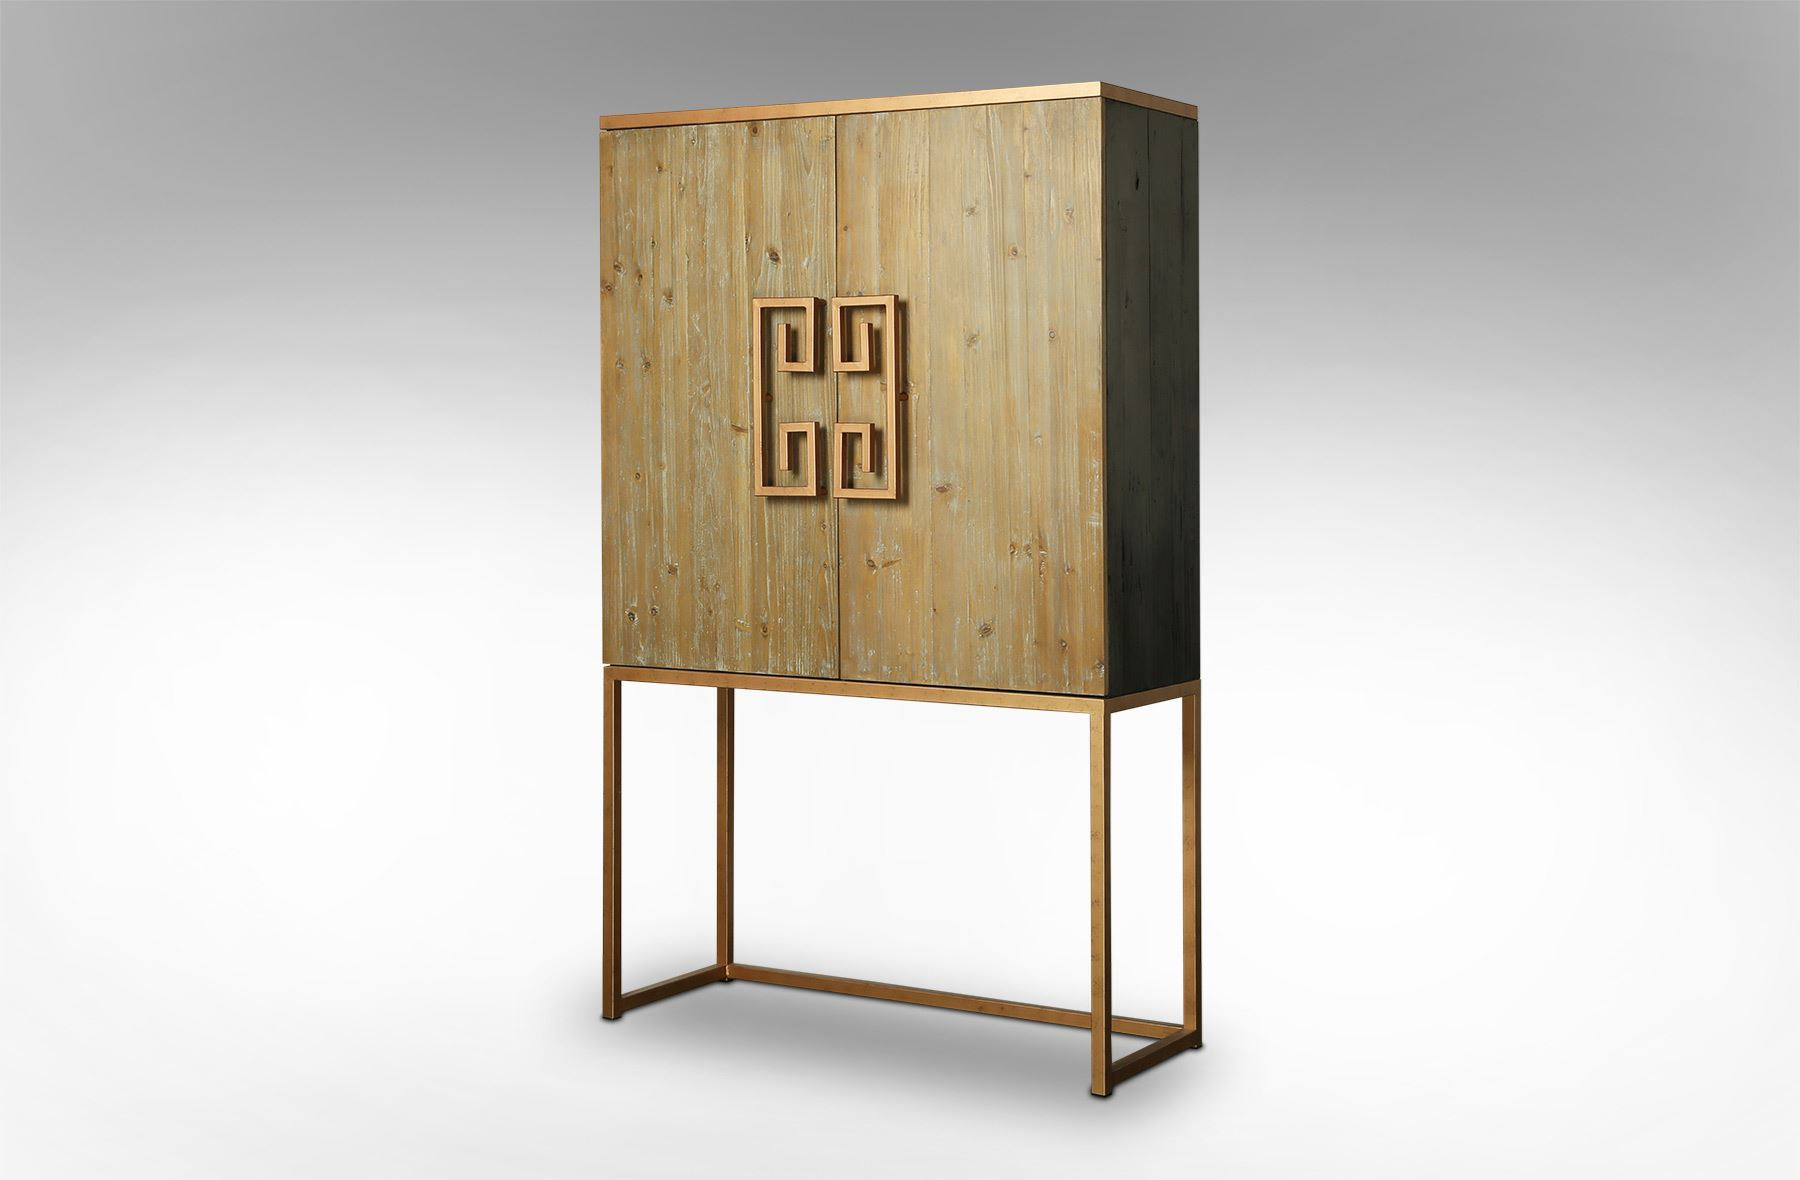 ikea storage ntoylapi en me glass room door with kafe skoyro doors and buffets portes cabinets living cabinet hemnes